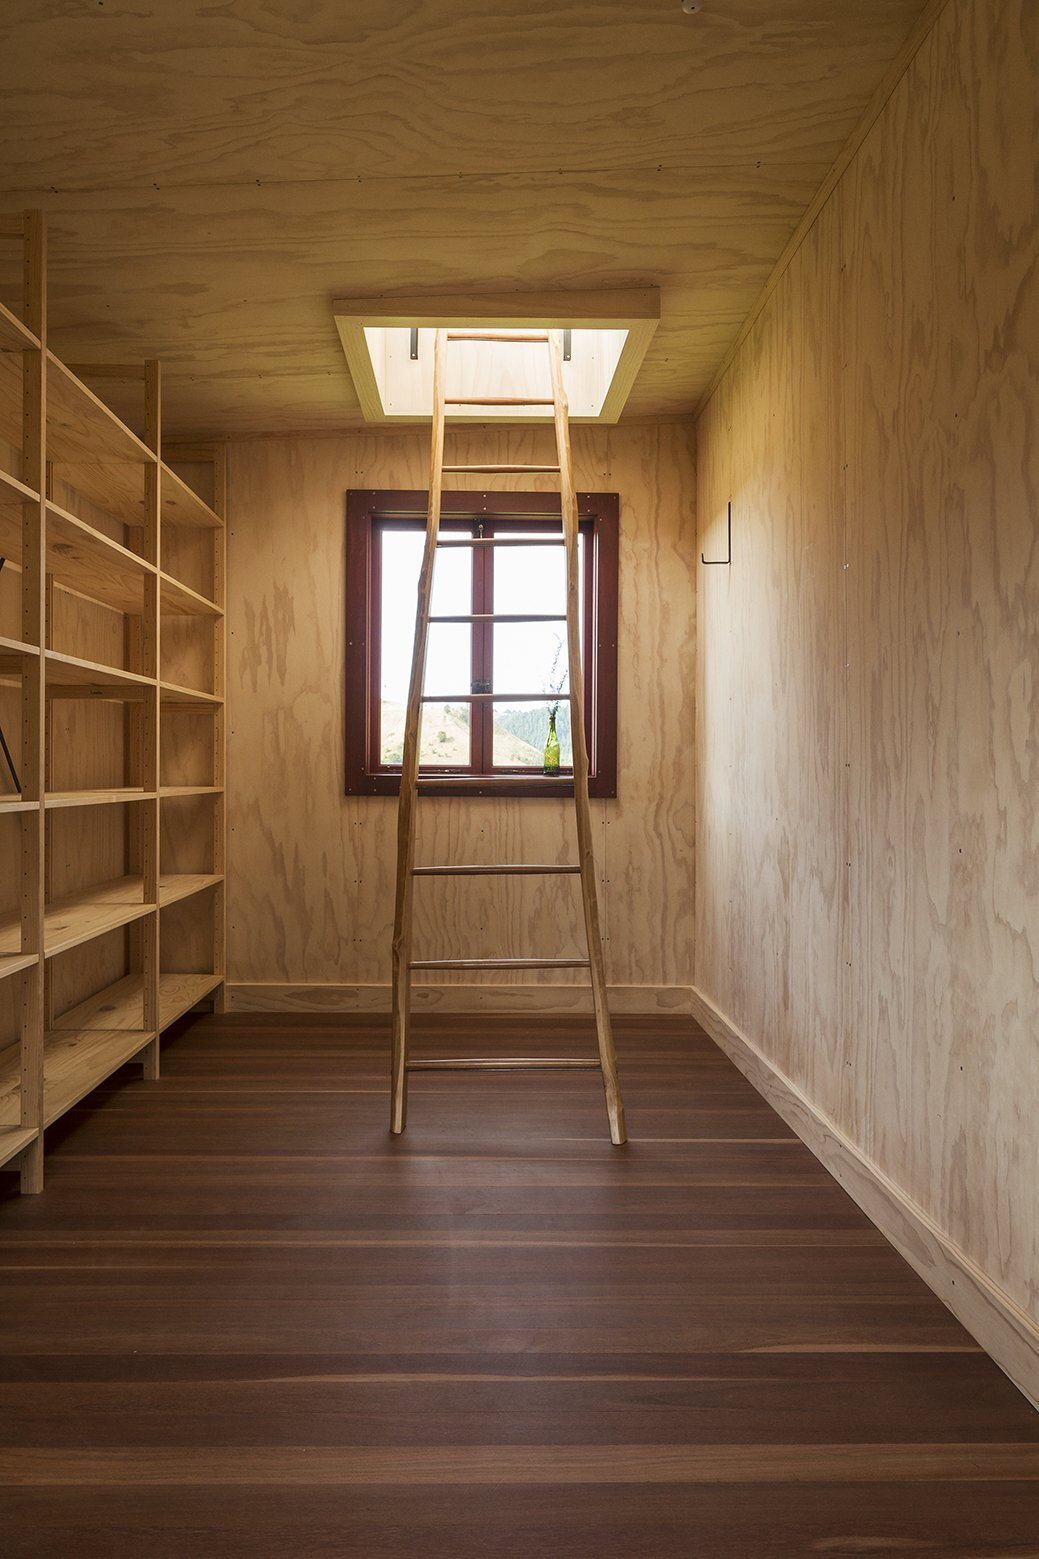 Longbush Ecosanctuary Welcome Shelter - Sarosh Mulla Design - New Zealand - Storage and Ladders - Humble Homes